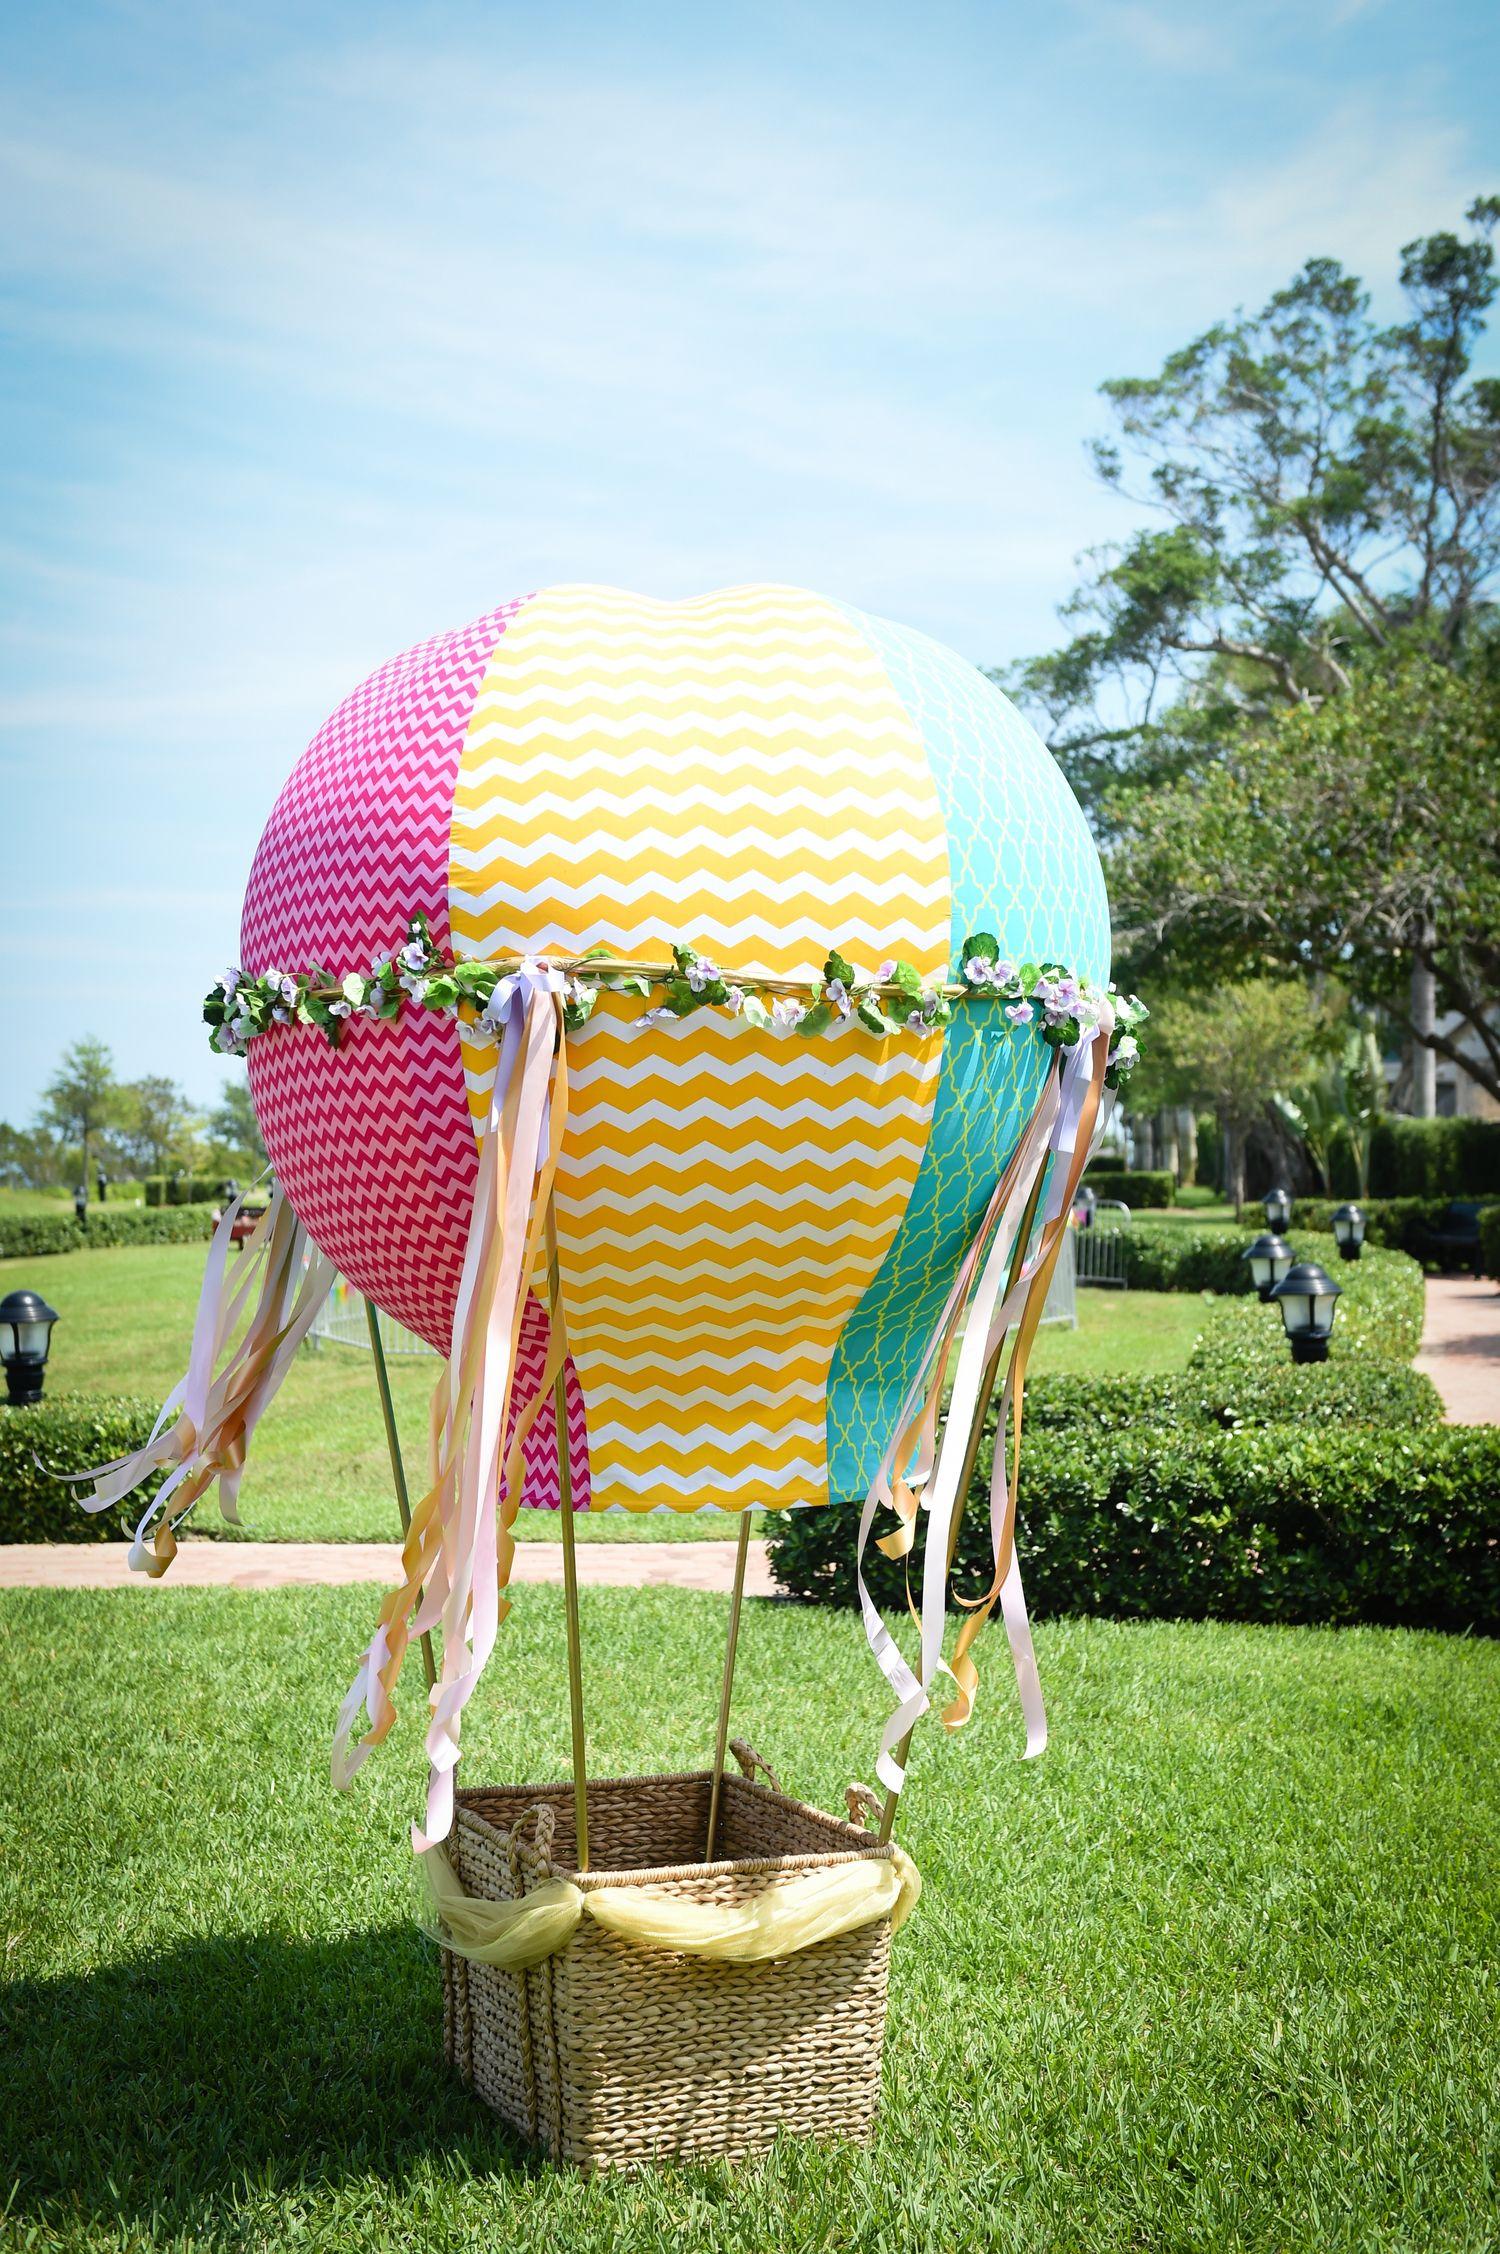 DSC_5231.jpg Diy hot air balloons, Hot air balloon, Balloons